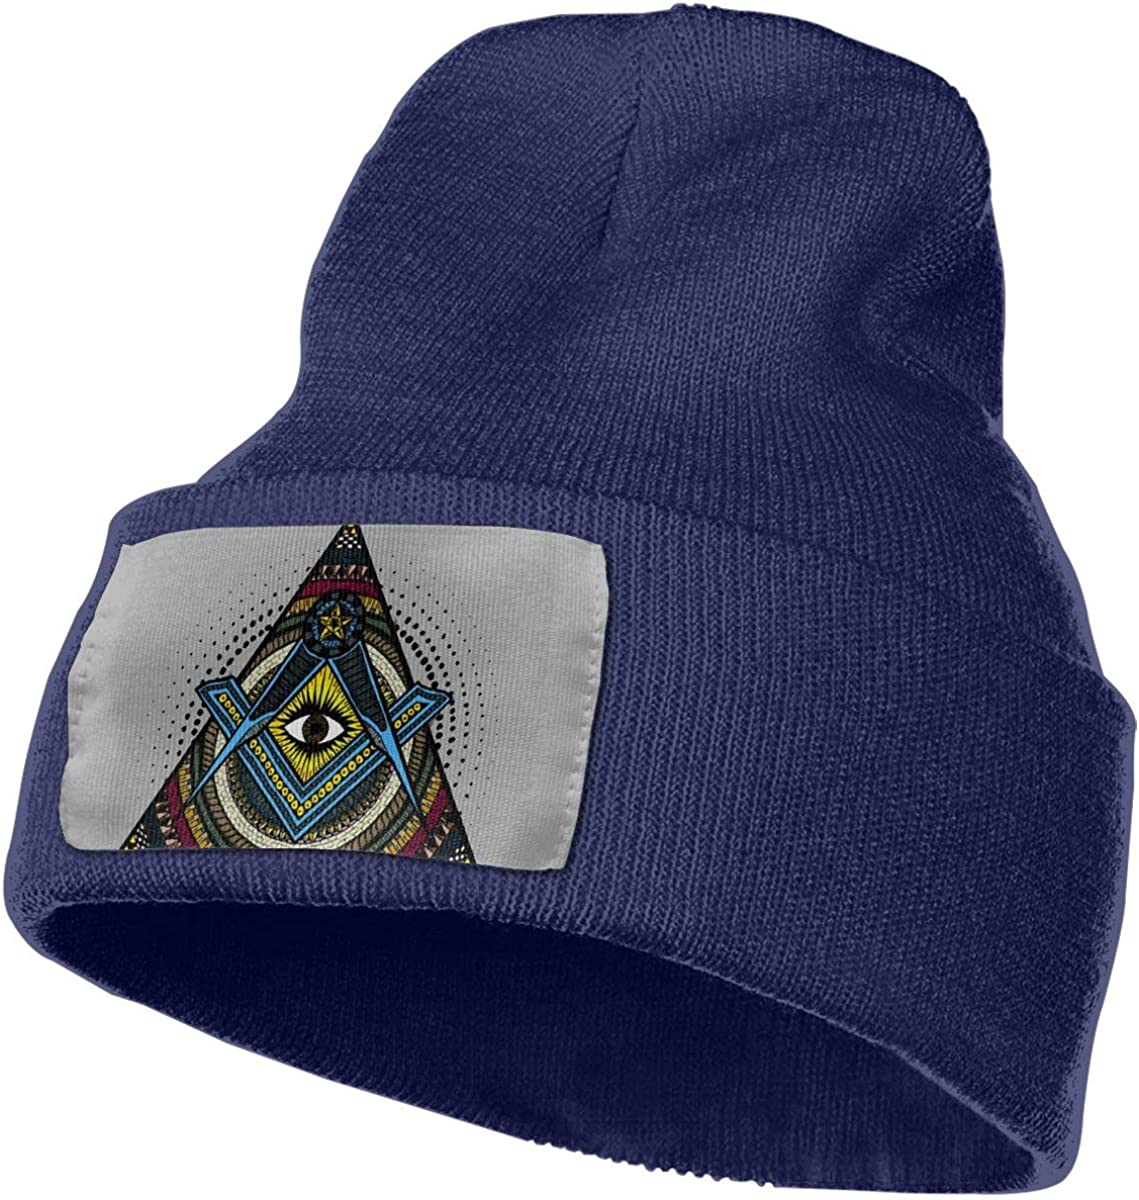 JimHappy Free-Mason Eyes Winter Warm Hats,Knit Slouchy Thick Skull Cap Black